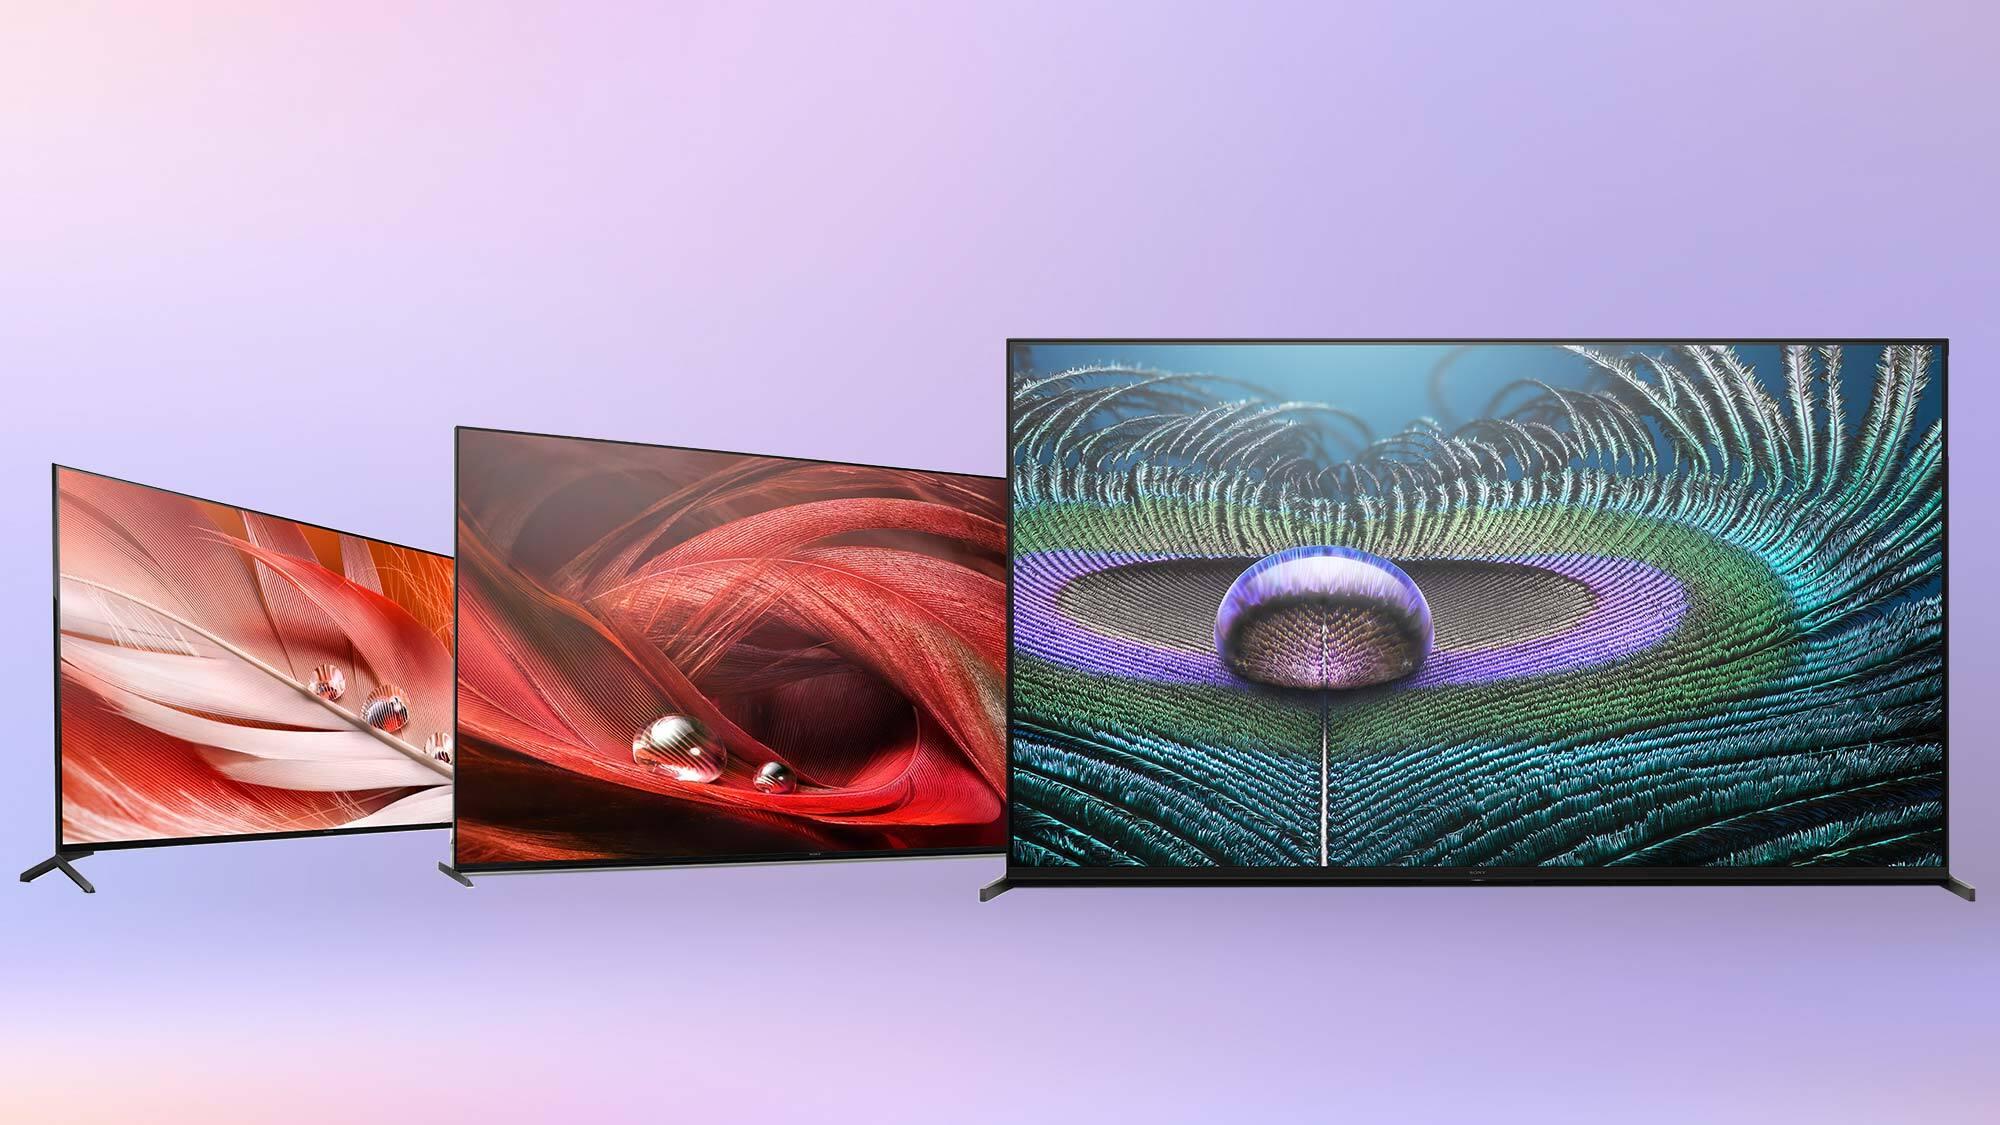 Sony Bravia XR 2021 TVs